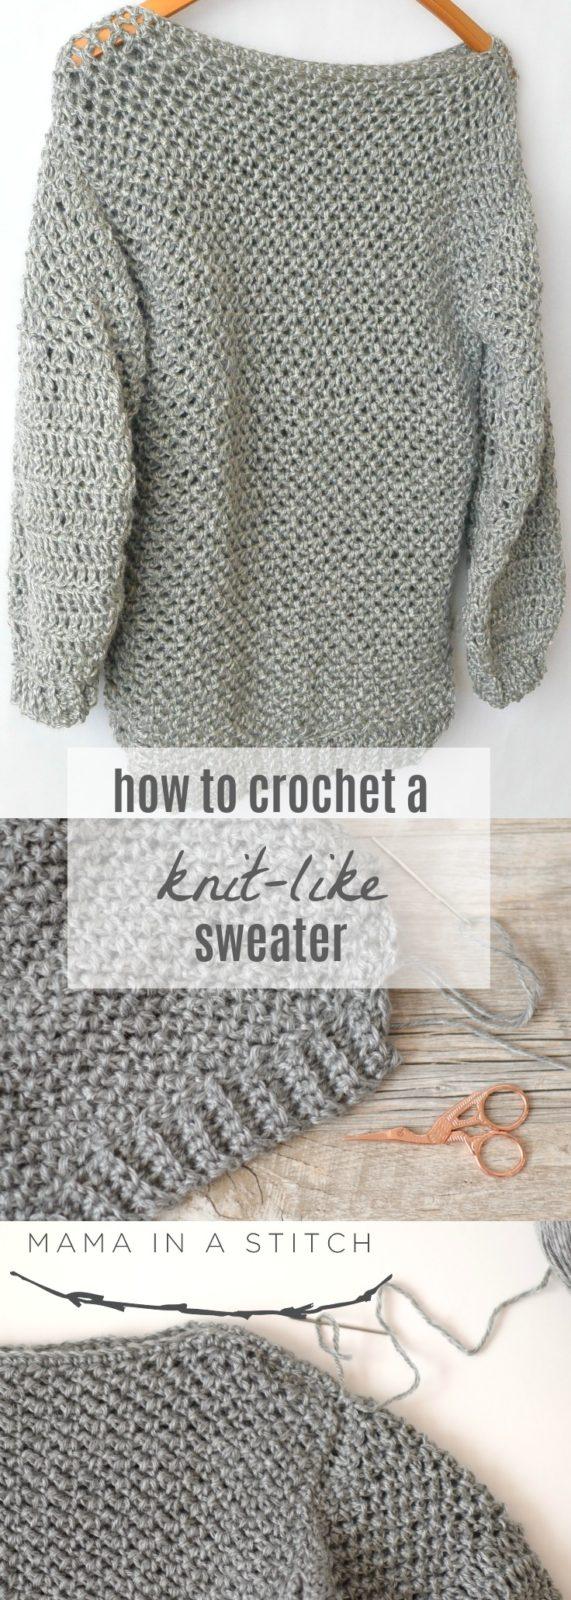 crochet sweater pin rcnmktp